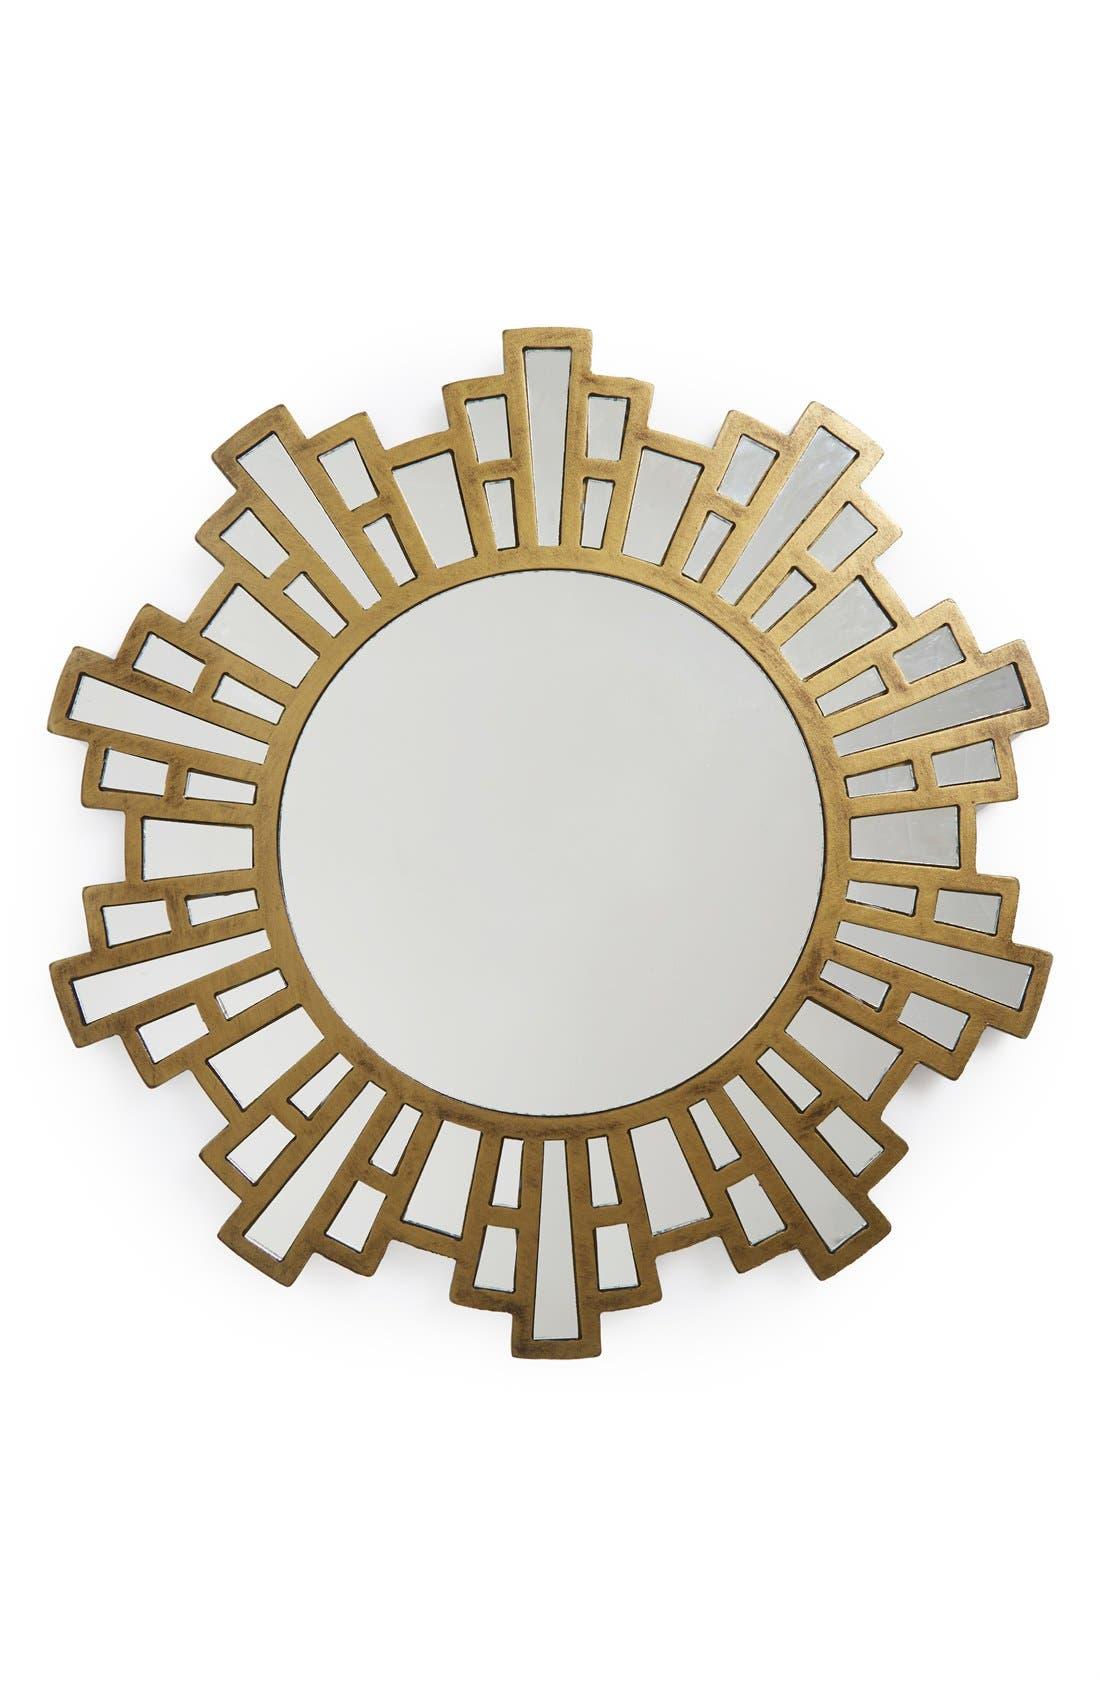 Main Image - Era Home 'Gold Starburst' Mirror